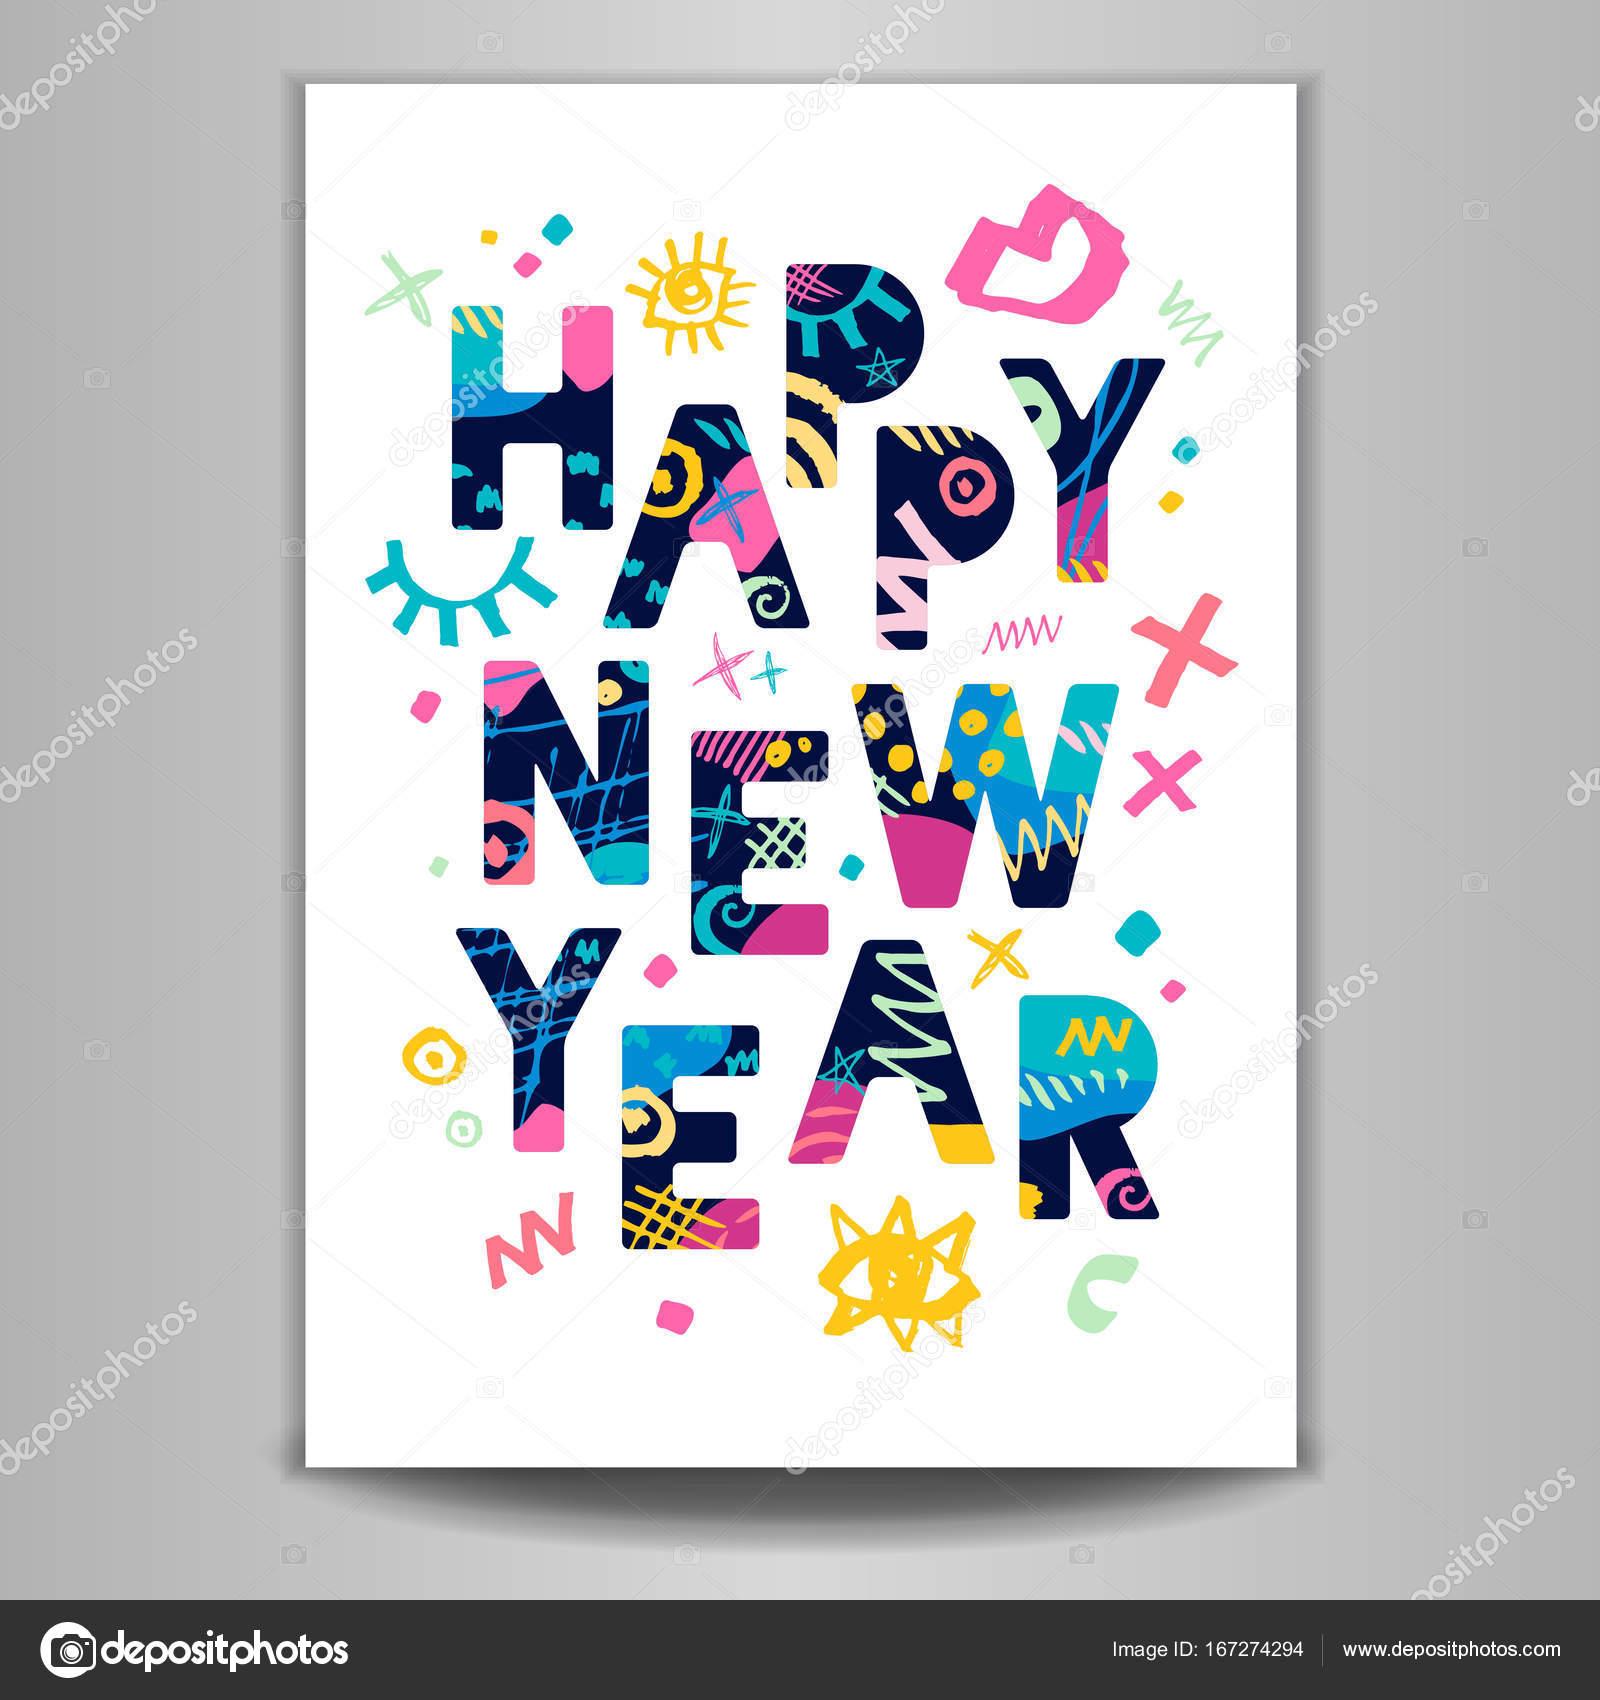 2018 happy new year greeting card stock vector iraidabearlala 2018 happy new year greeting card stock vector kristyandbryce Gallery